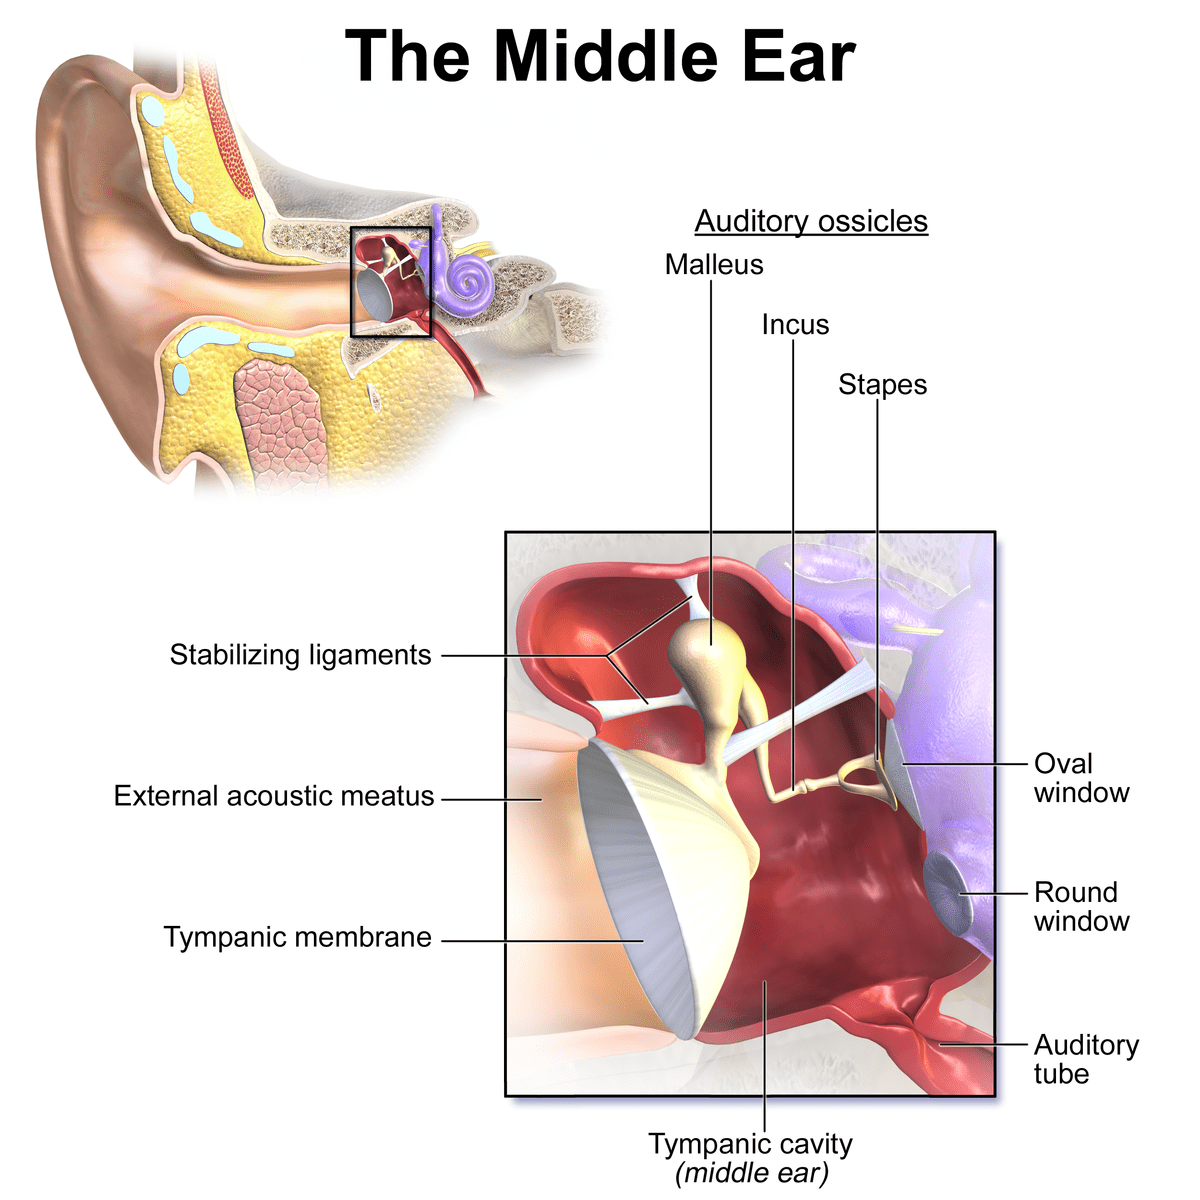 Blausen 0330 EarAnatomy MiddleEar - The association between tinnitus, the neck and TMJ